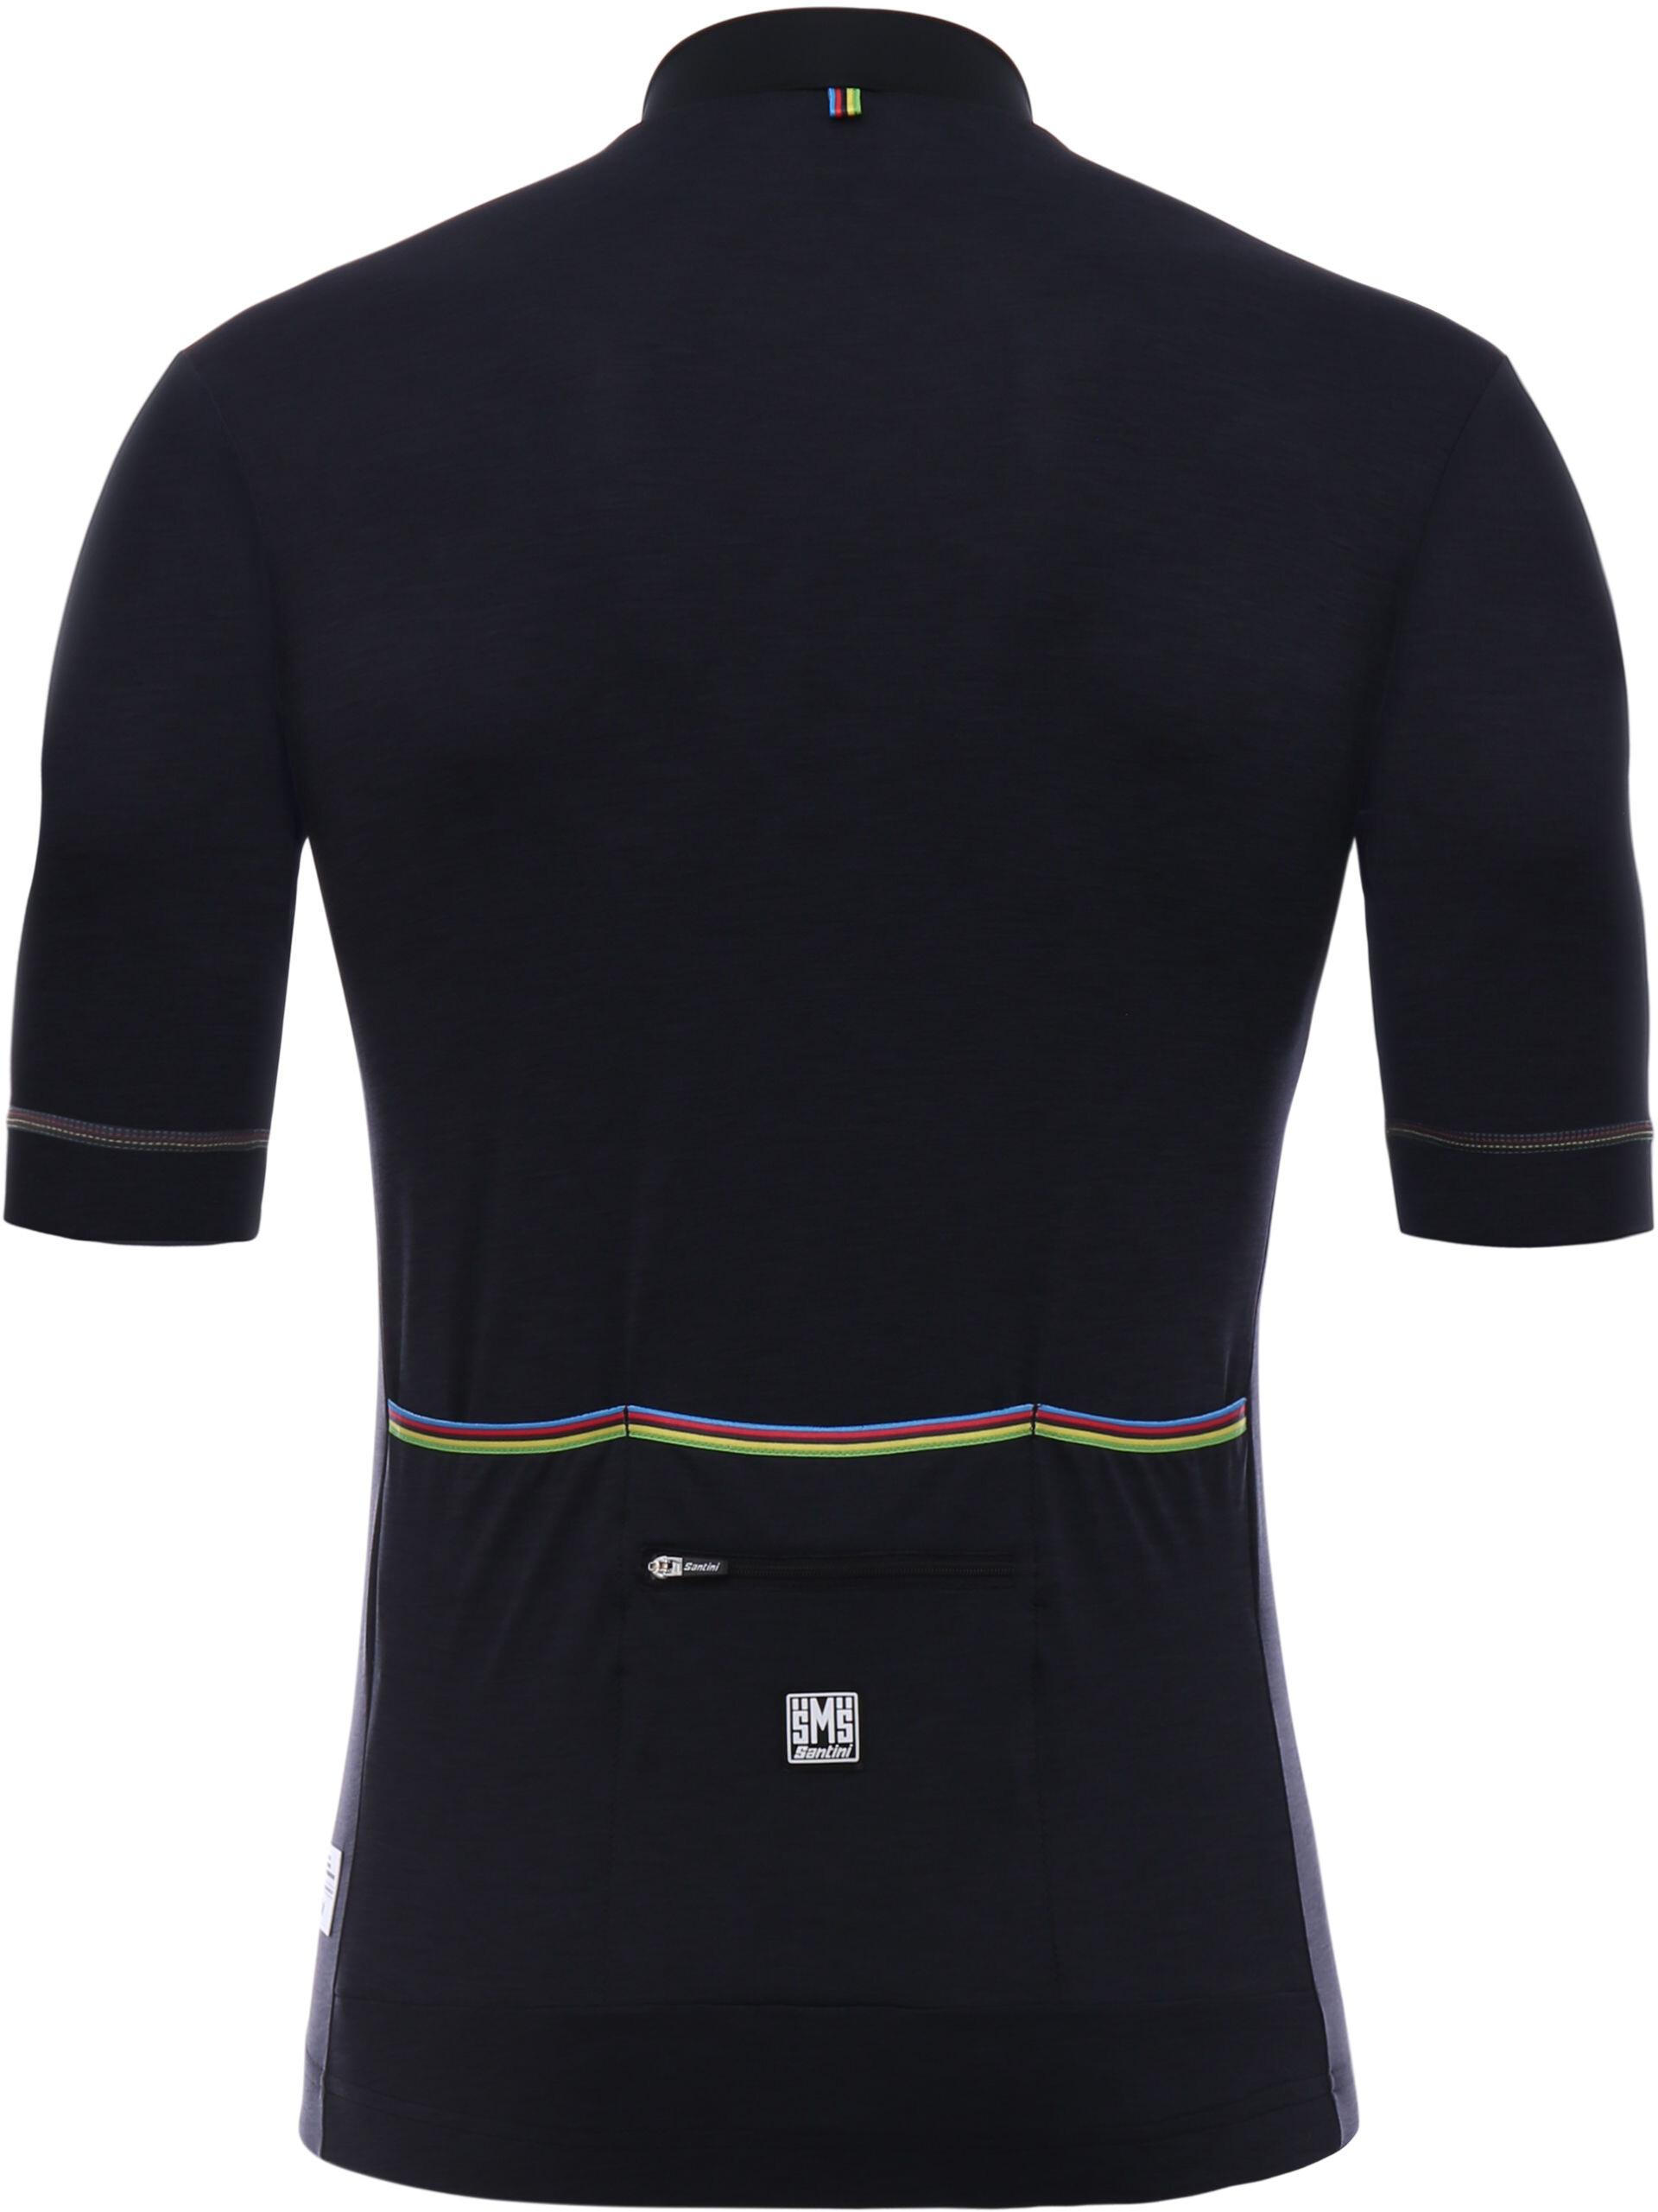 Santini UCI Short Sleeve Jersey Men black at Addnature.co.uk 668f26834